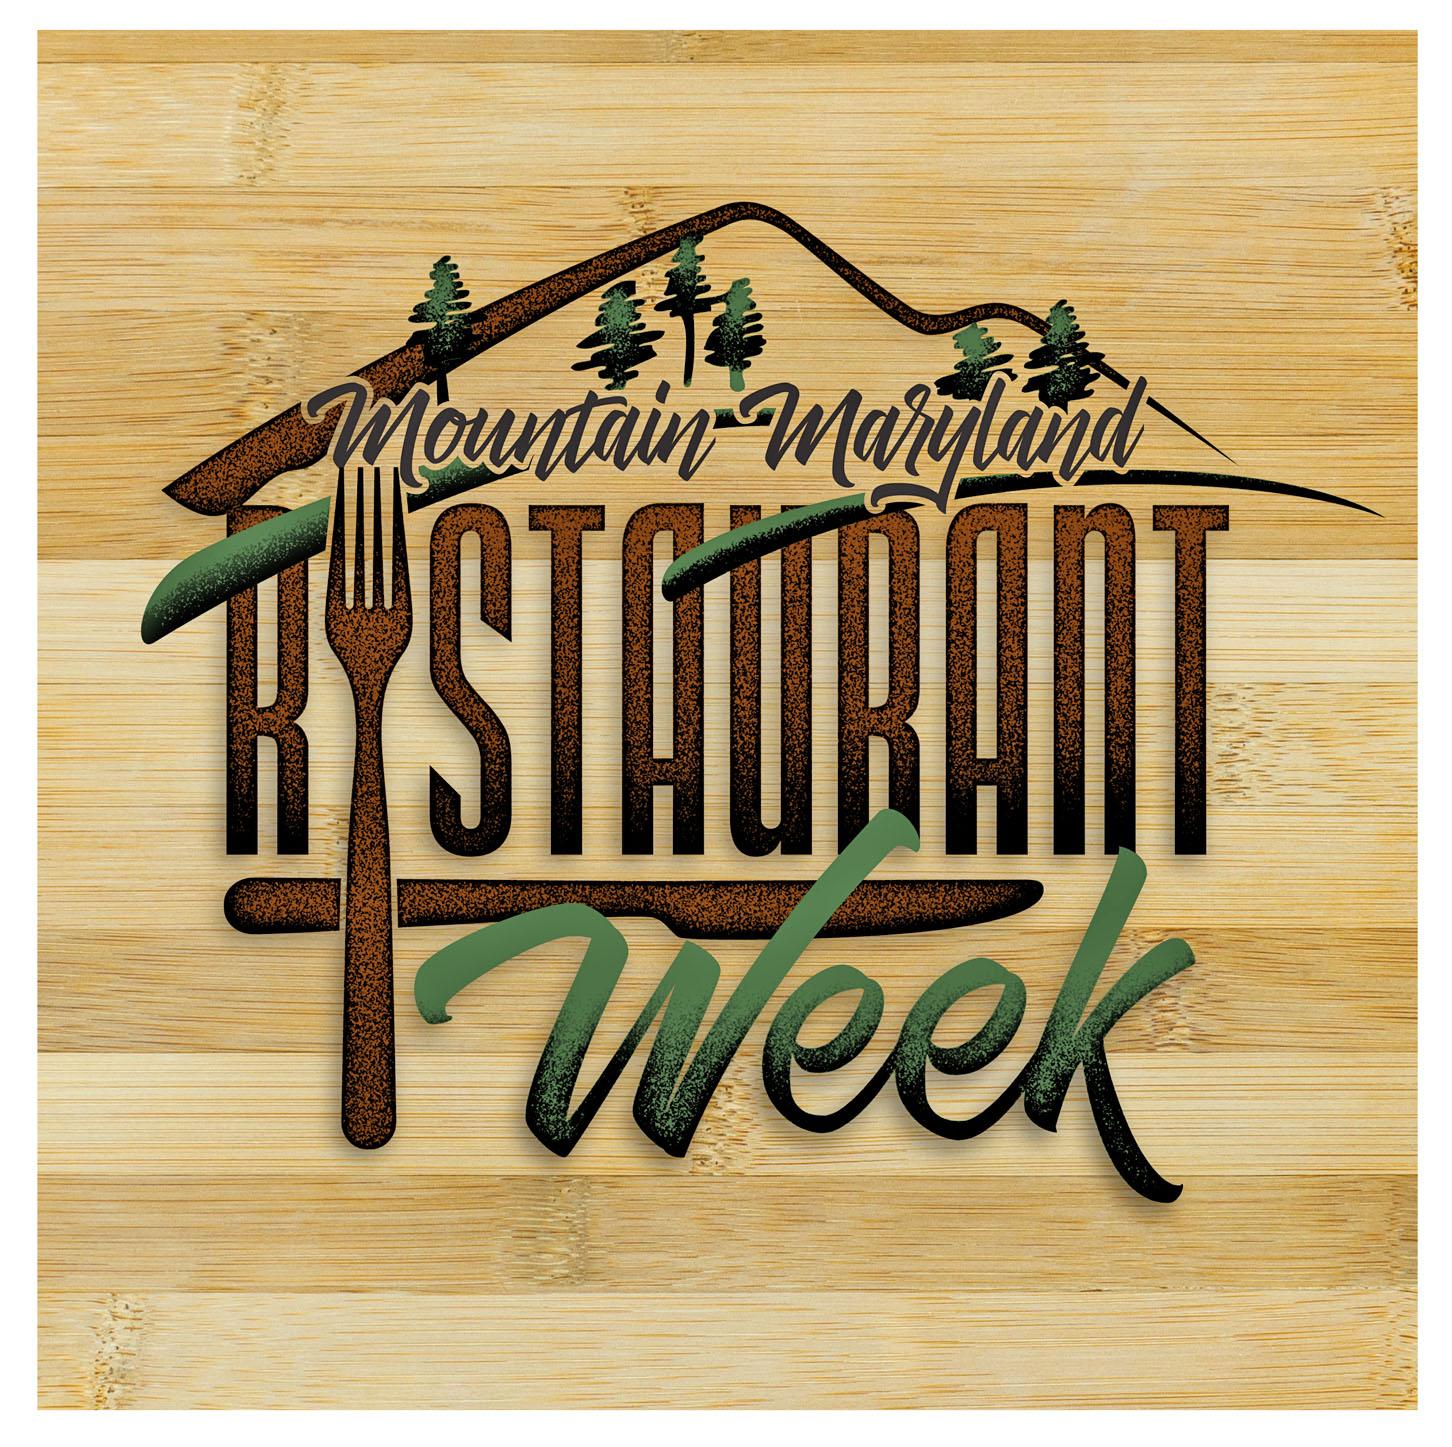 Mountain Maryland Restaurant Week logo